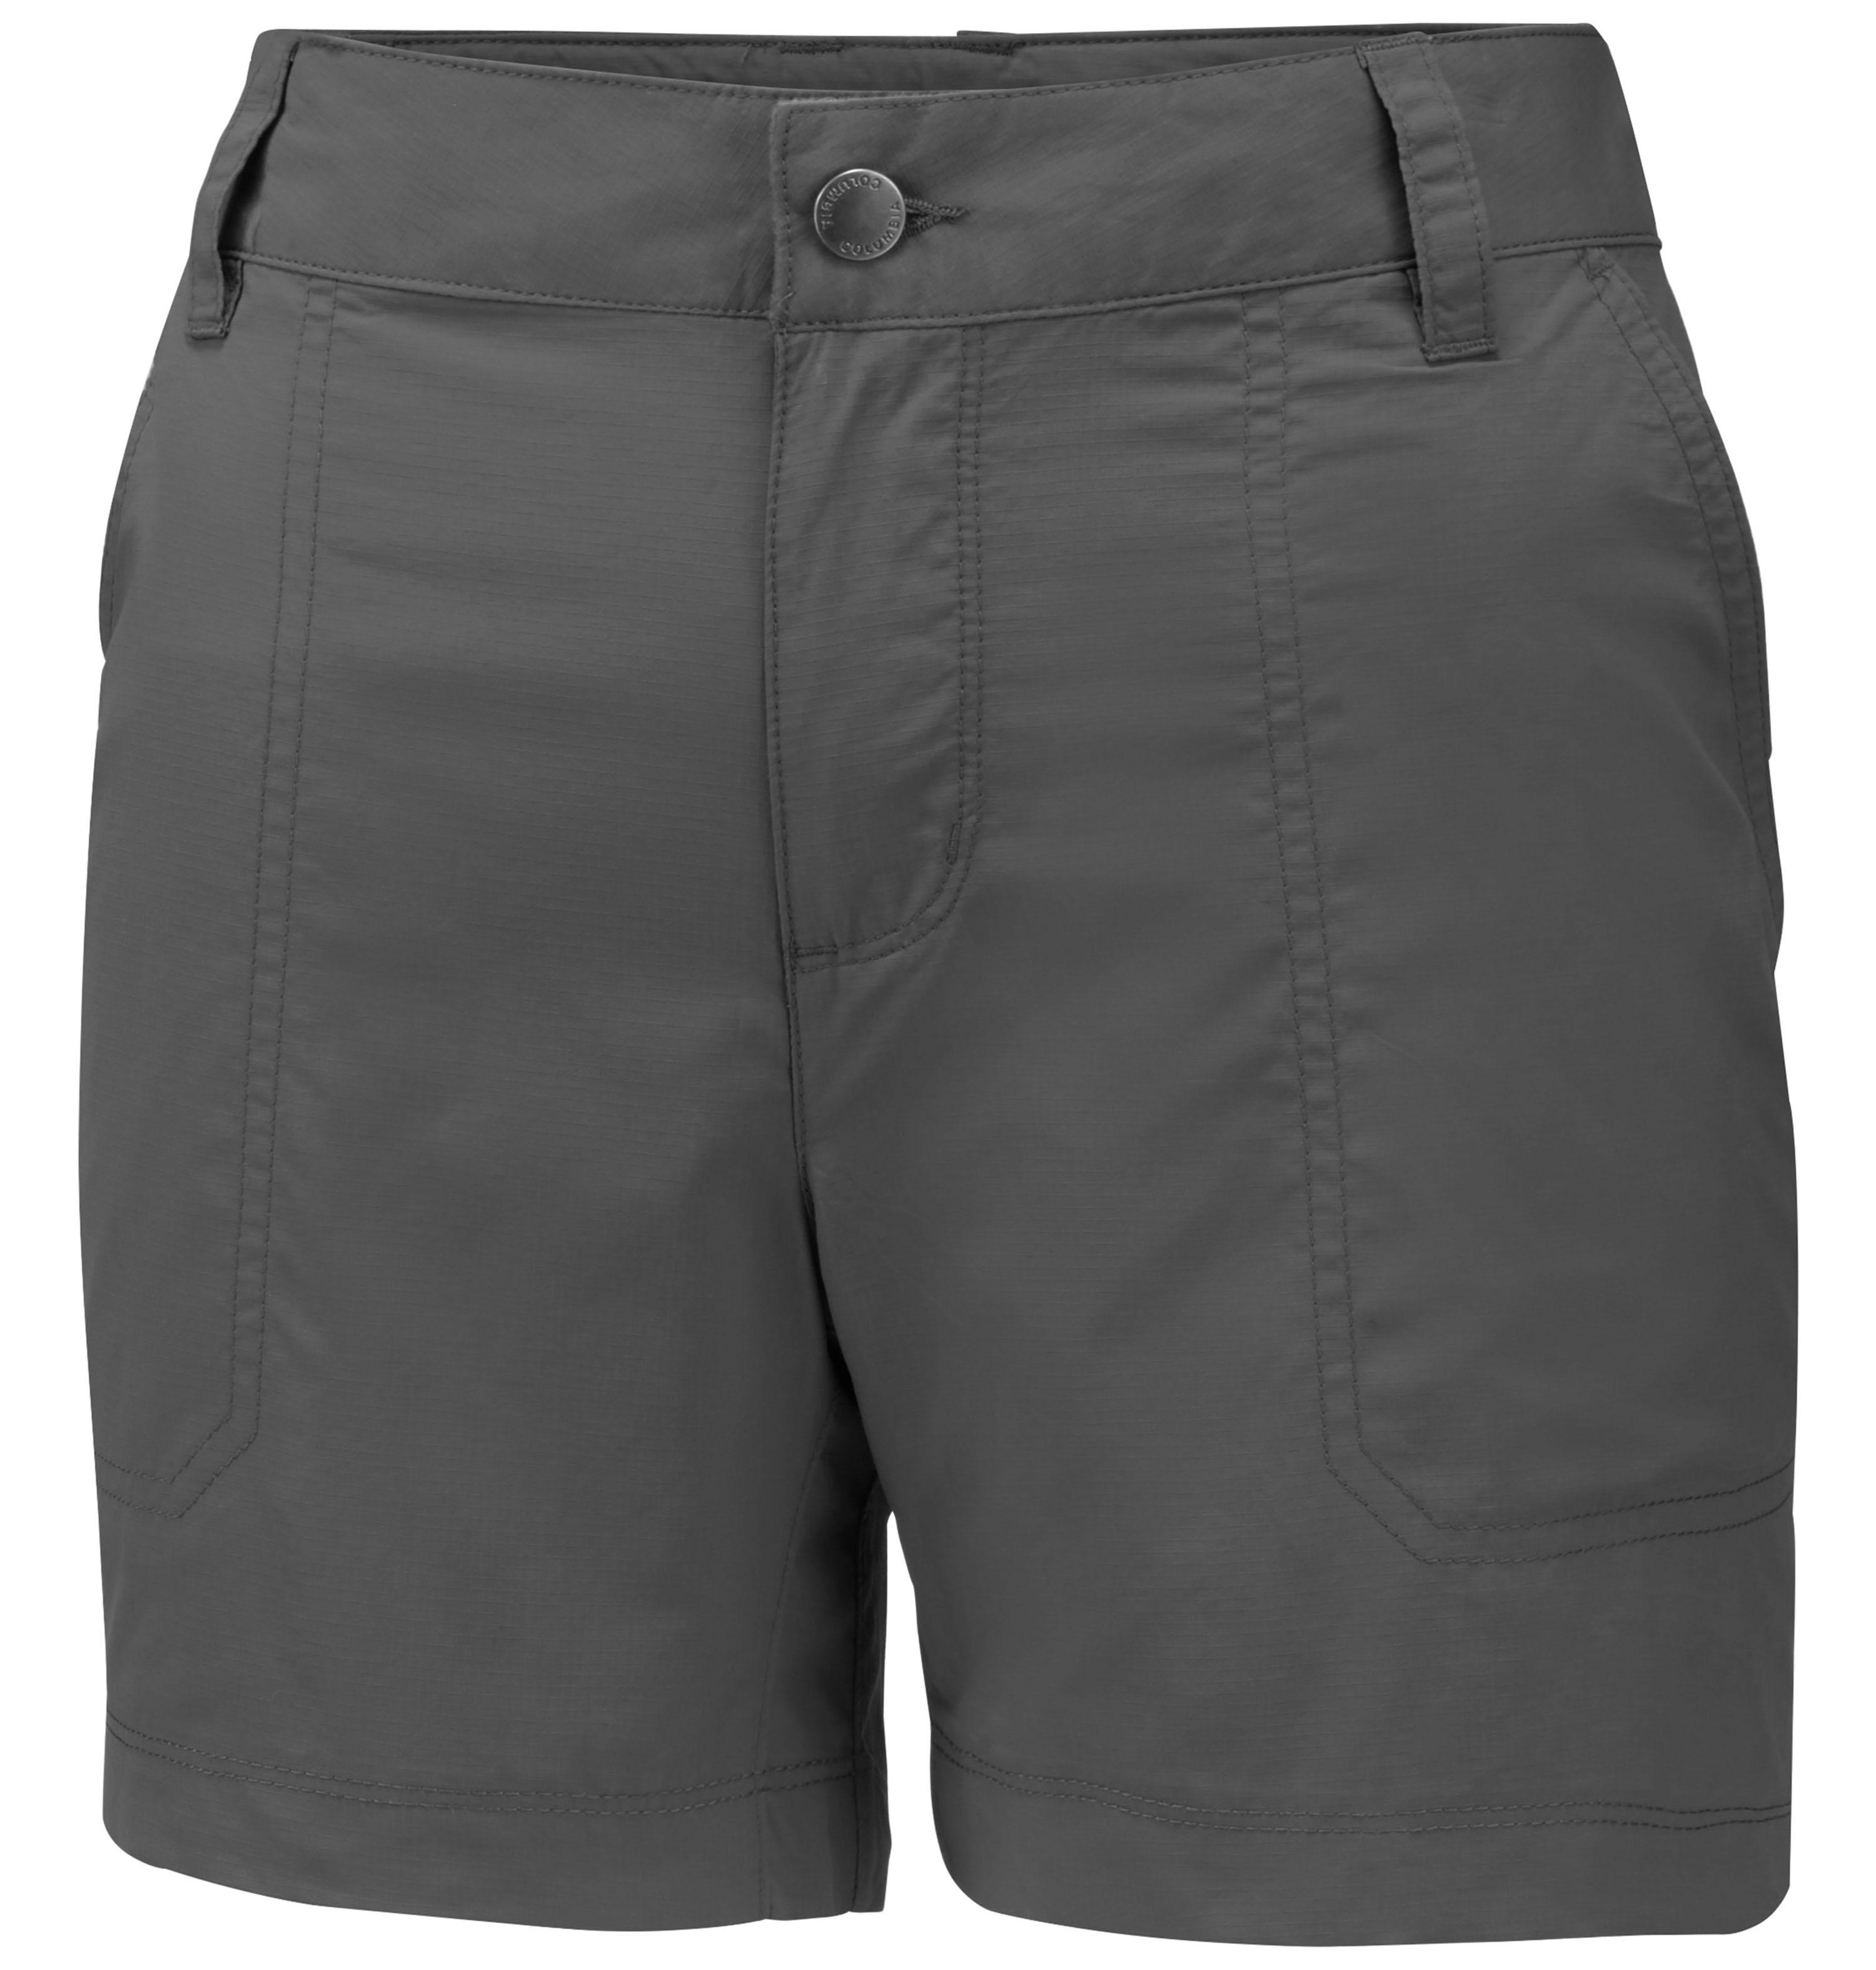 Comprar Columbia Shorts Silver Ridge 2.0 cinza